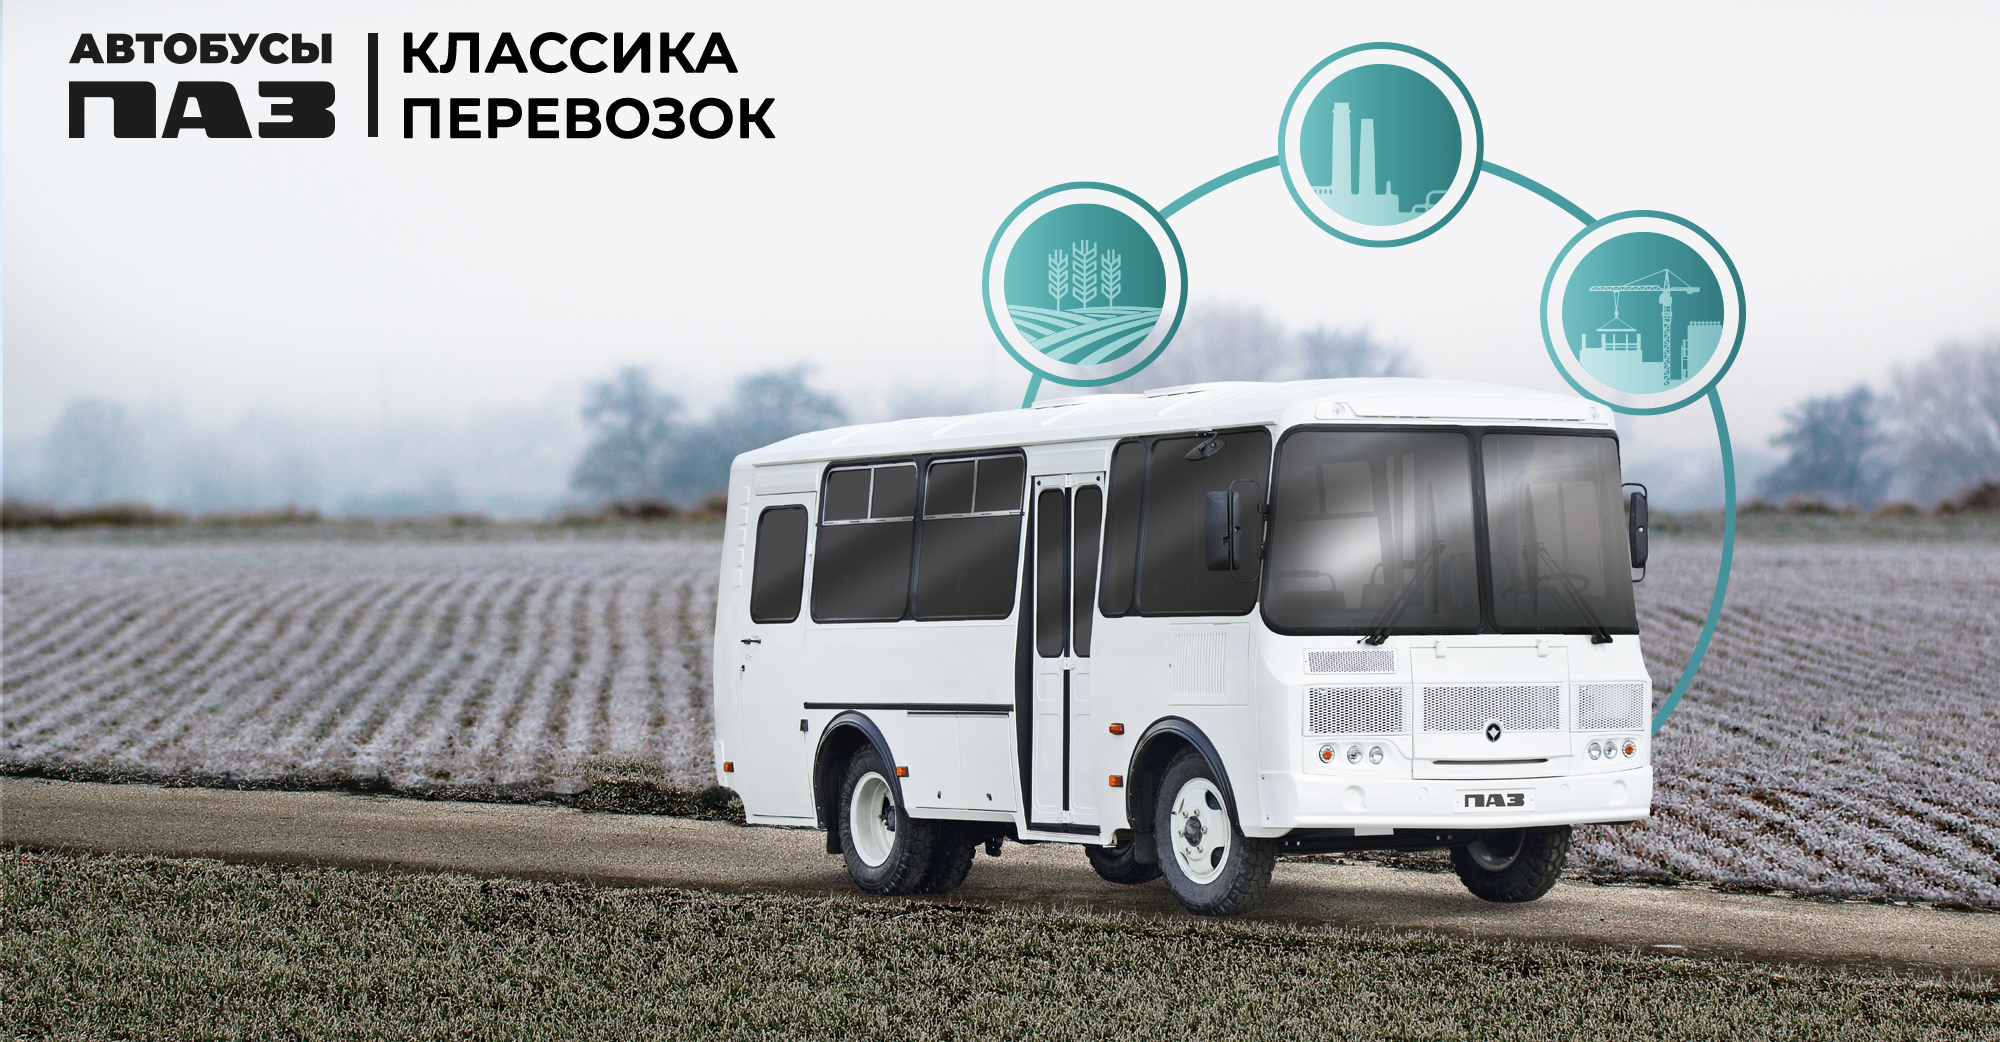 Спецпредложение ЛИЗИНГ 0% на 3 года при покупке автобусов ПАЗ